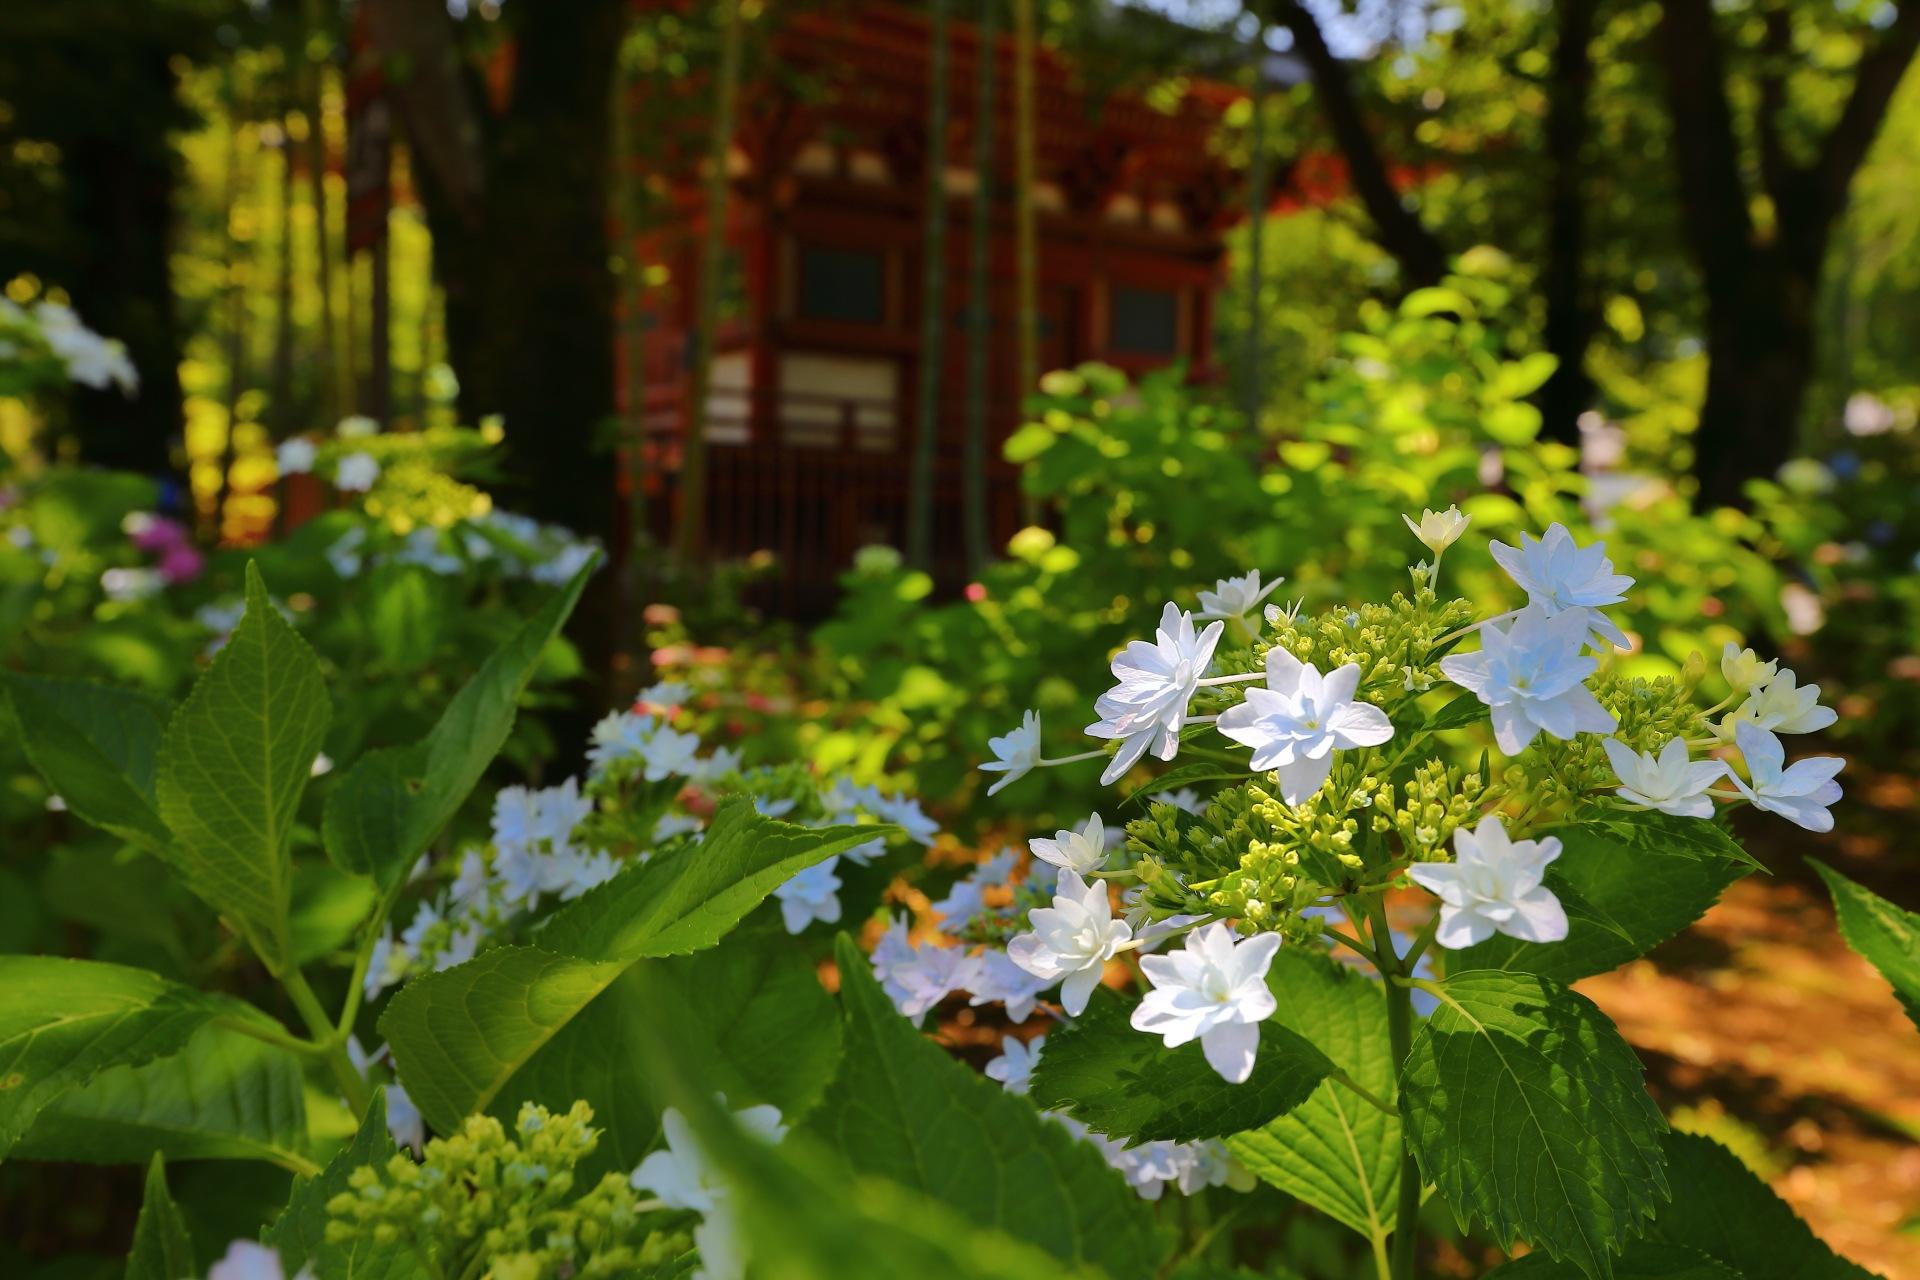 Hydrangea Area by takashi.mizoguchi